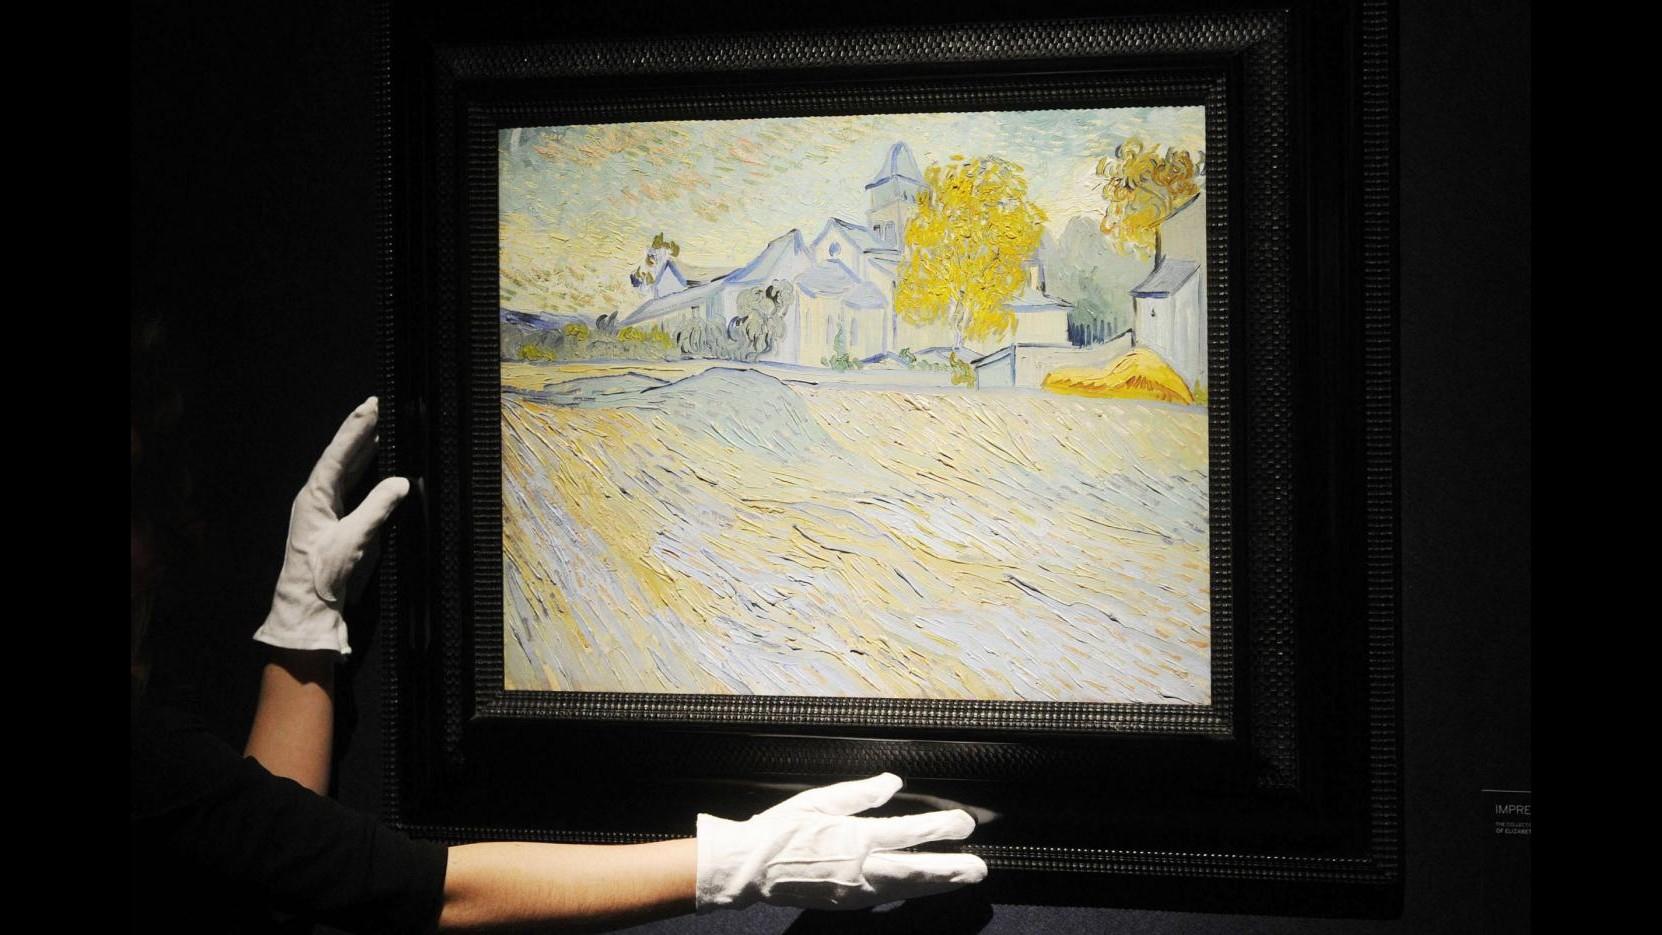 Opere d'arte di Liz Taylor vendute all'asta, anche un Van Gogh